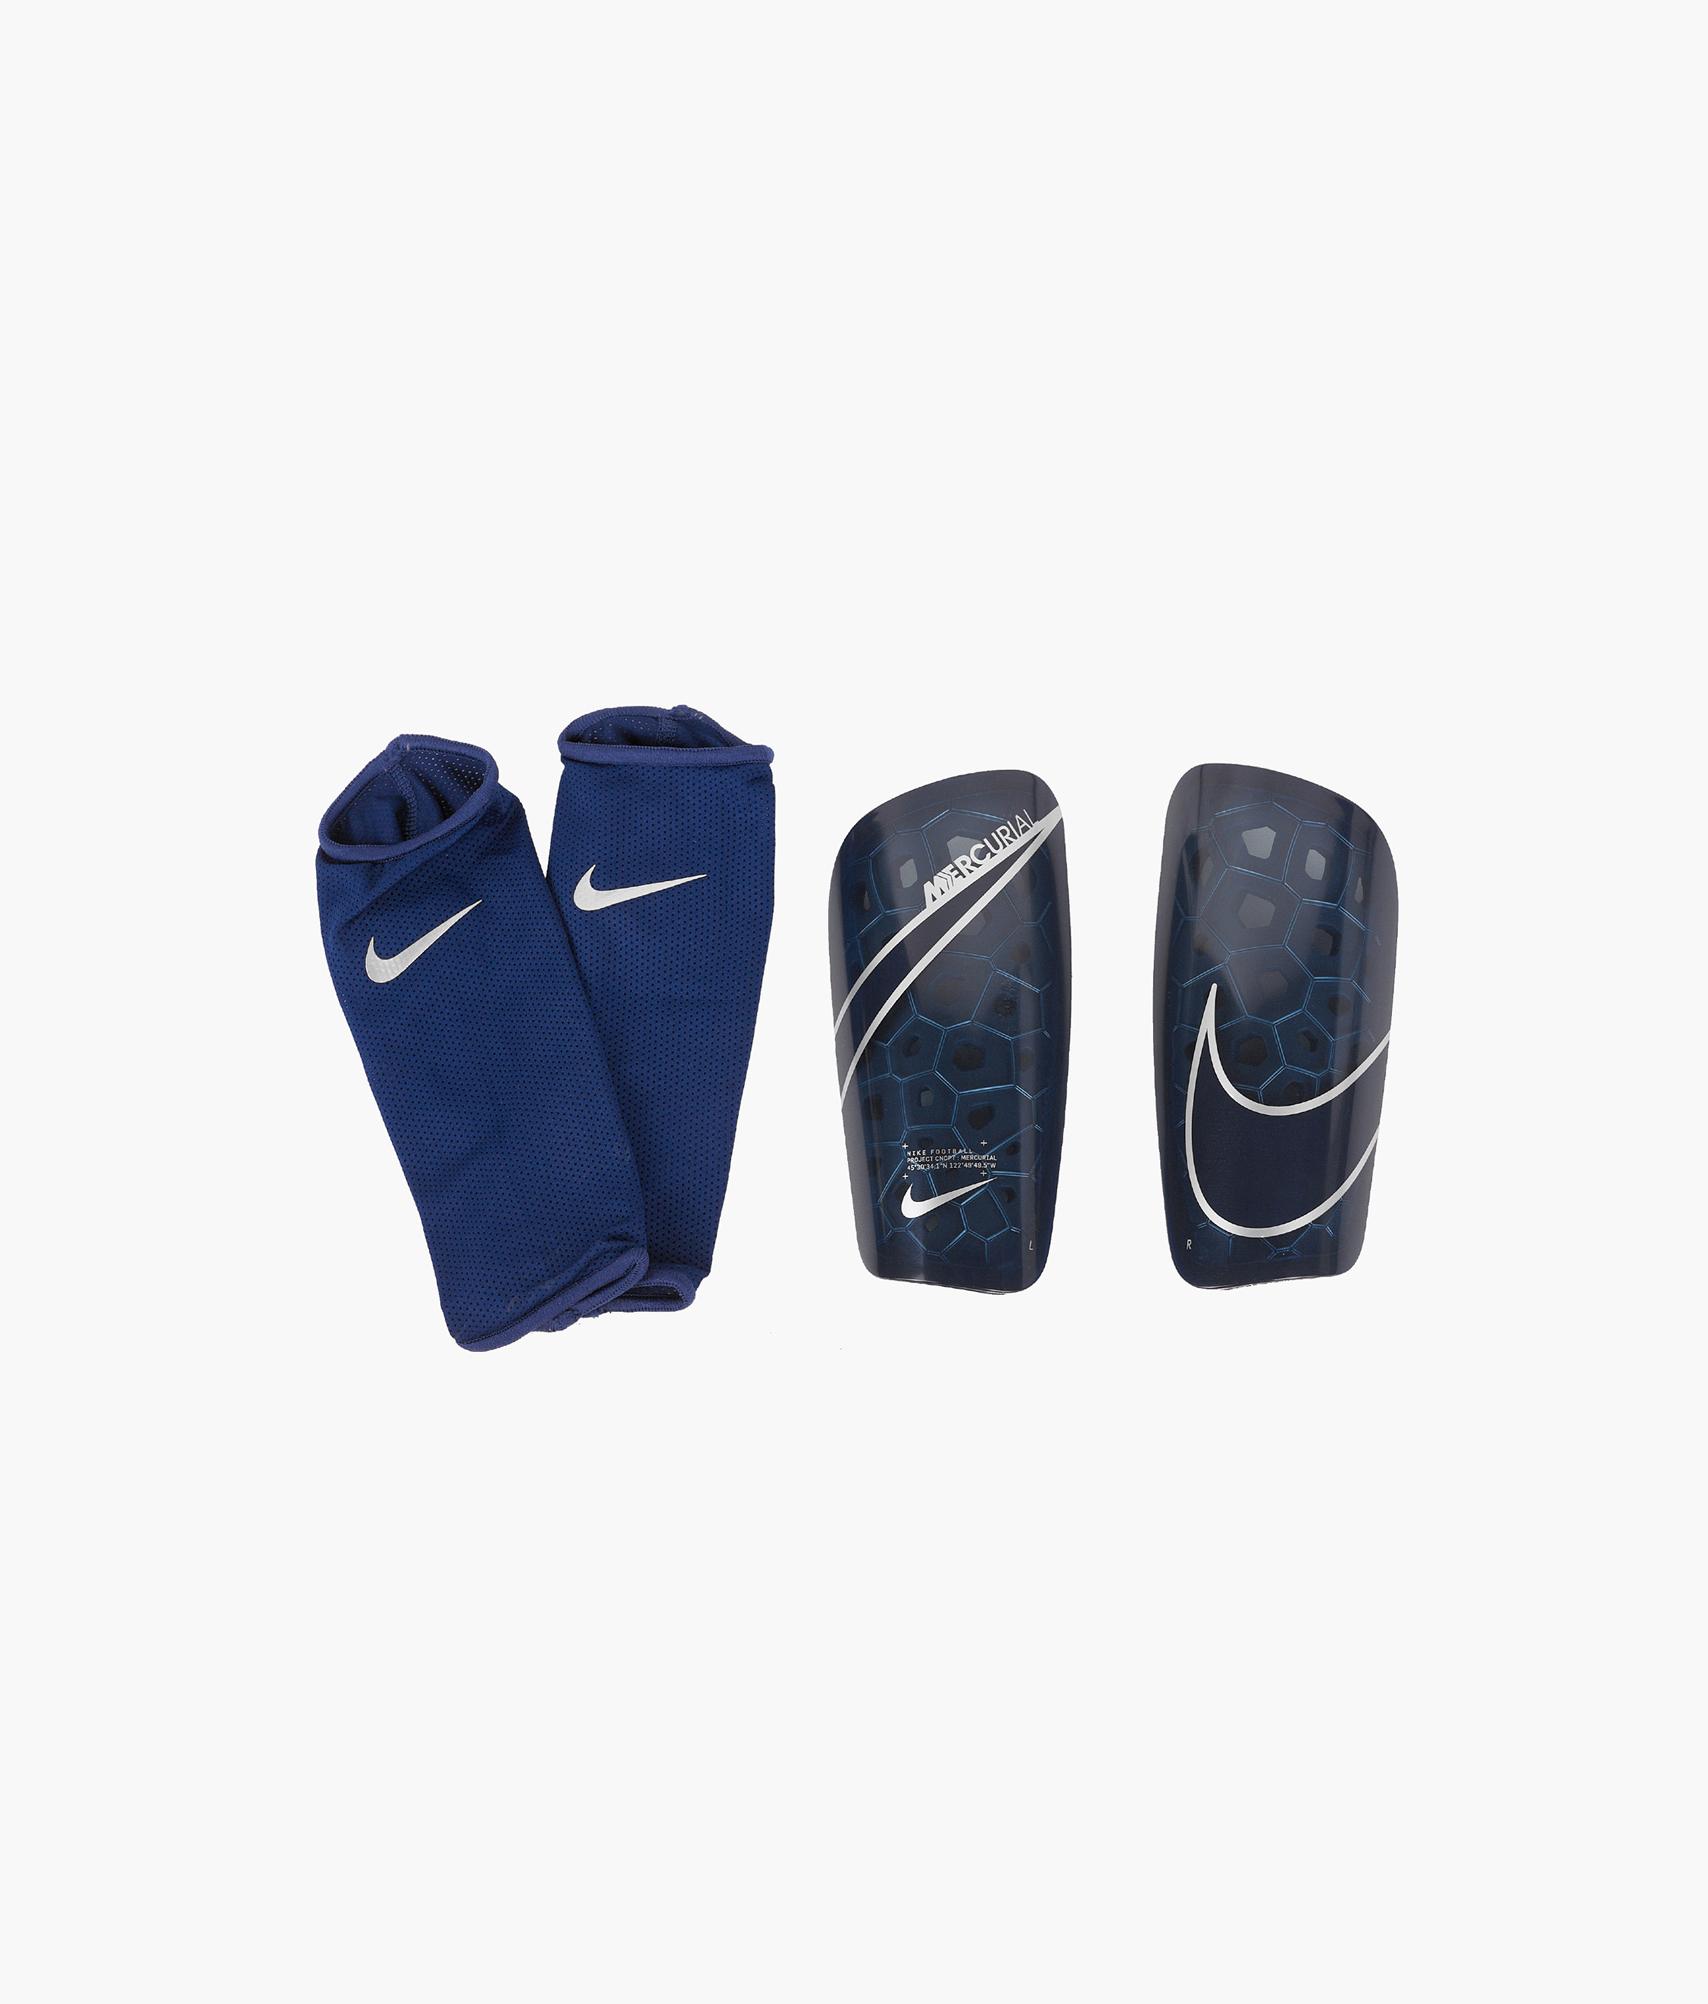 Фото - Щитки Nike Зенит Цвет-Темно-Синий куртка женская trussardi цвет темно синий 36s00158 blue night размер l 46 48